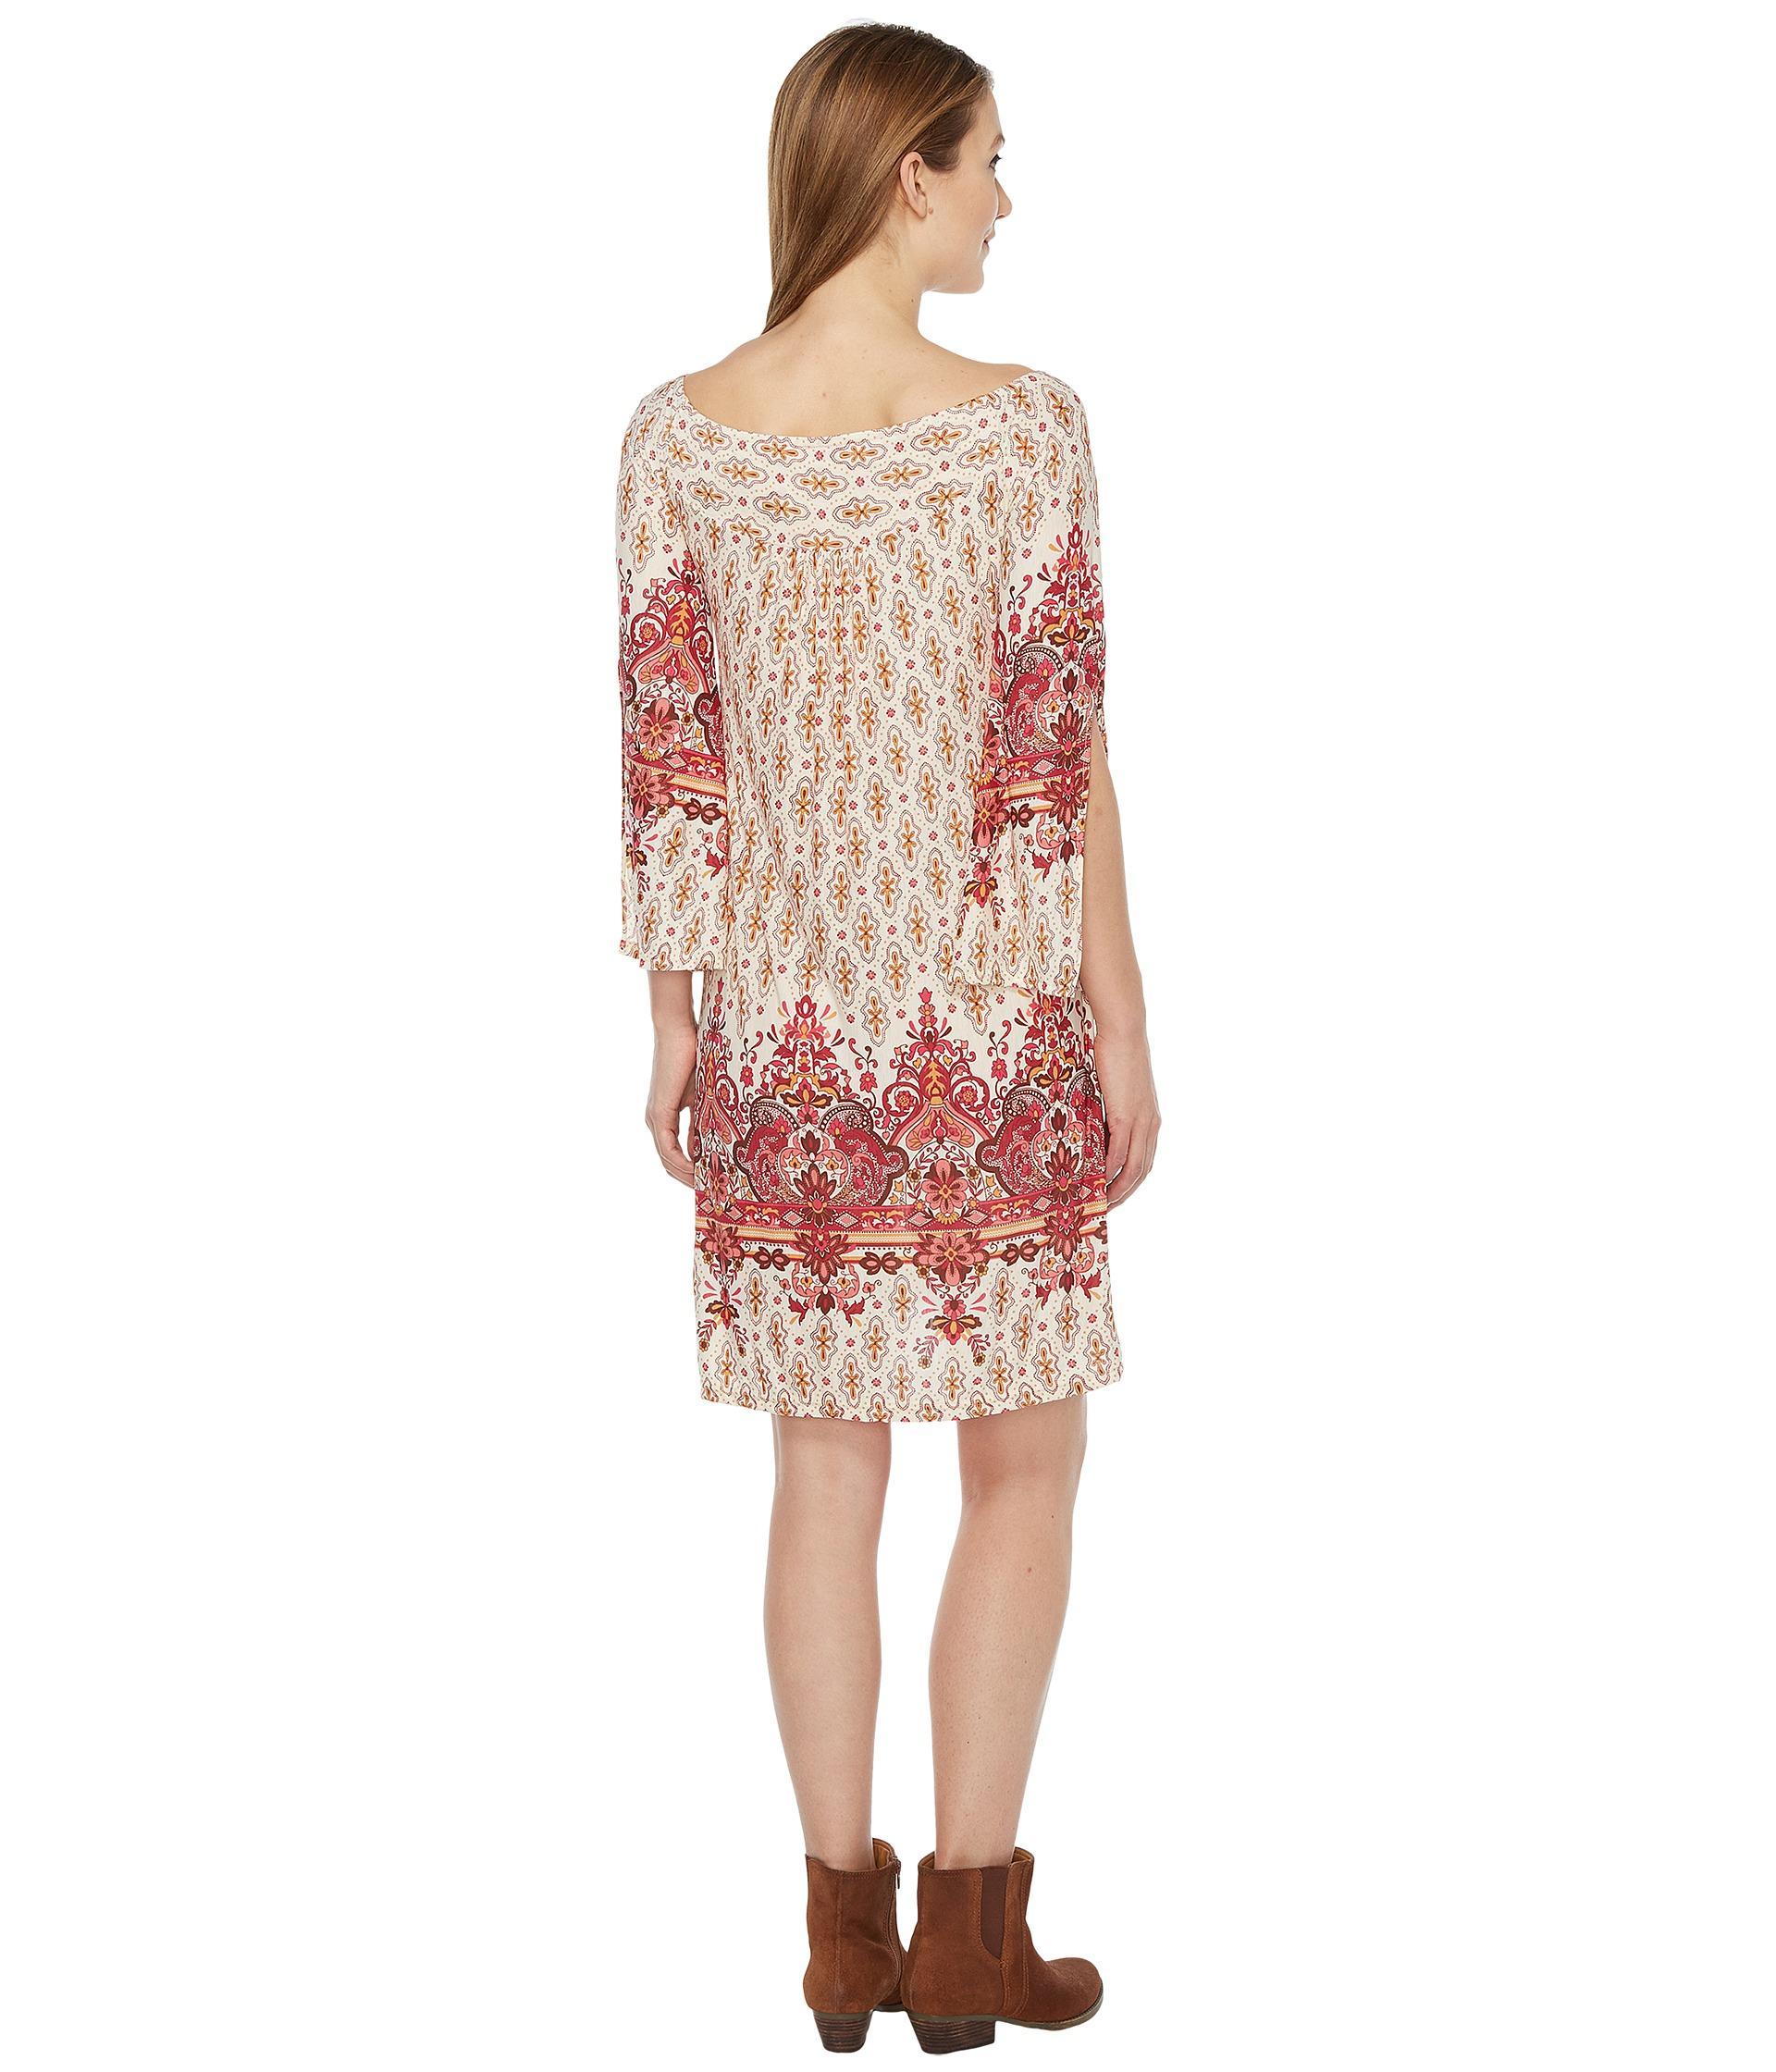 5e4065525bd Lyst - Roper 0875 Border Print Tunic dress in Red